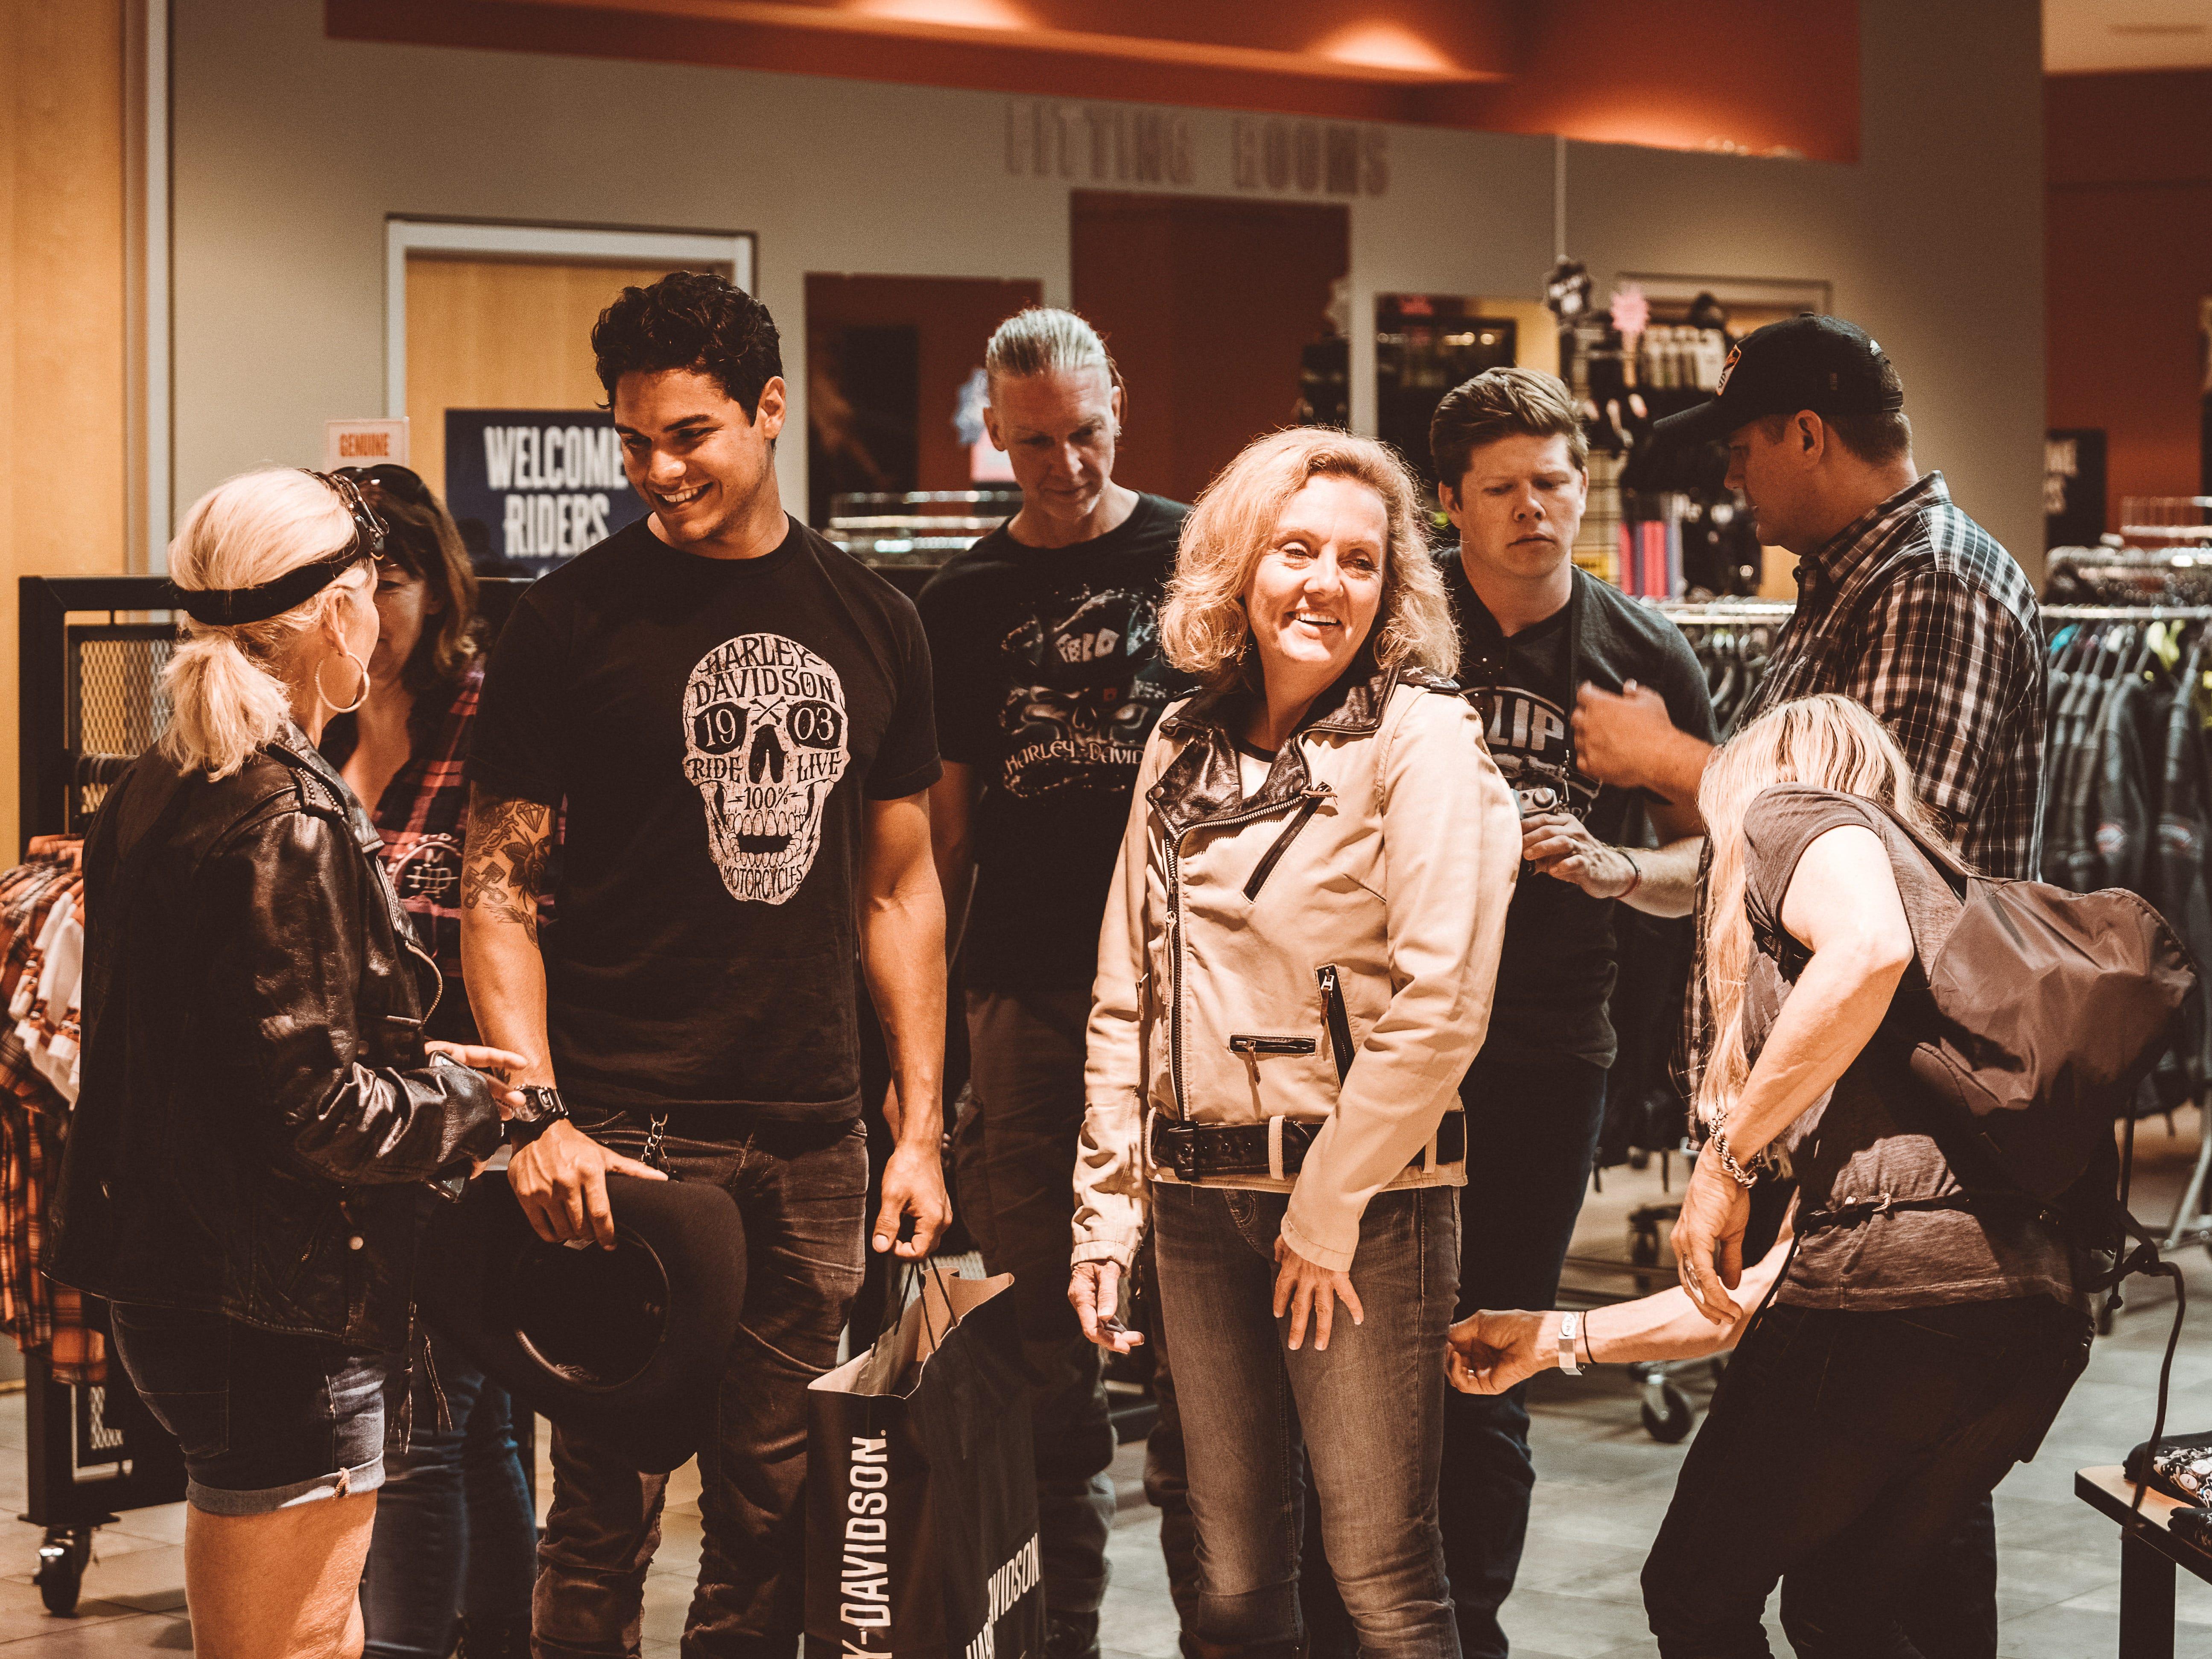 Majsan Bostrom  (from left), Harley-Davidson intern Alejandro Garrido, artist Greg Malenshek, journalist Amanda Kingsbury and Aaron Putnam of Joyride Productions get styled in Harley gear.